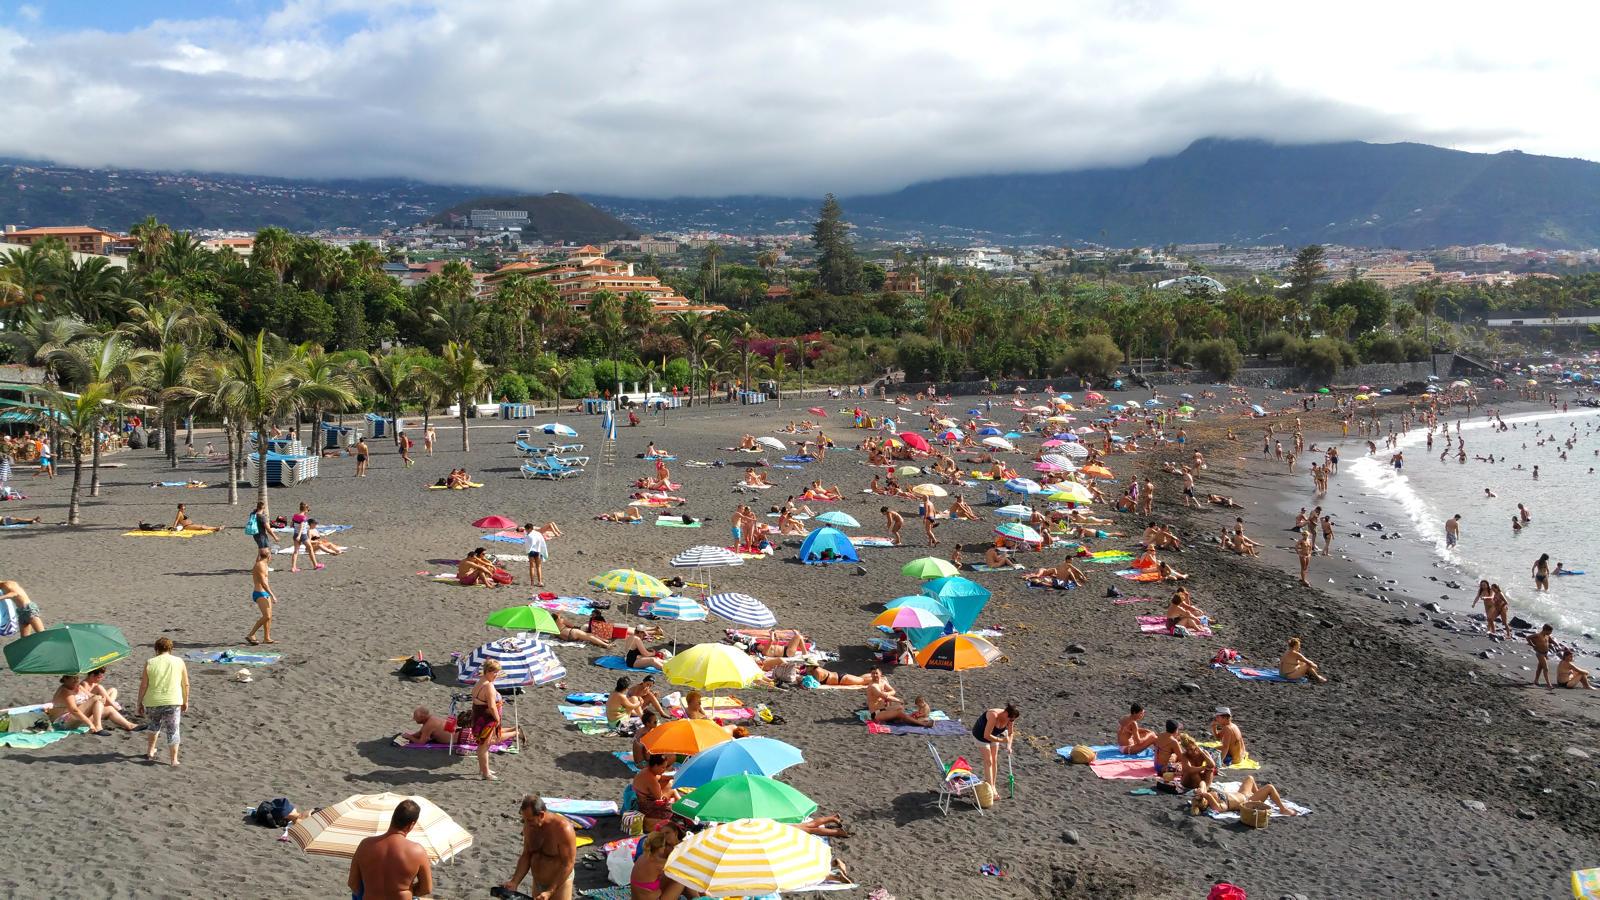 Alles rund um playa jardin den strand von puerto de la - Puerto de la cruz sehenswurdigkeiten ...